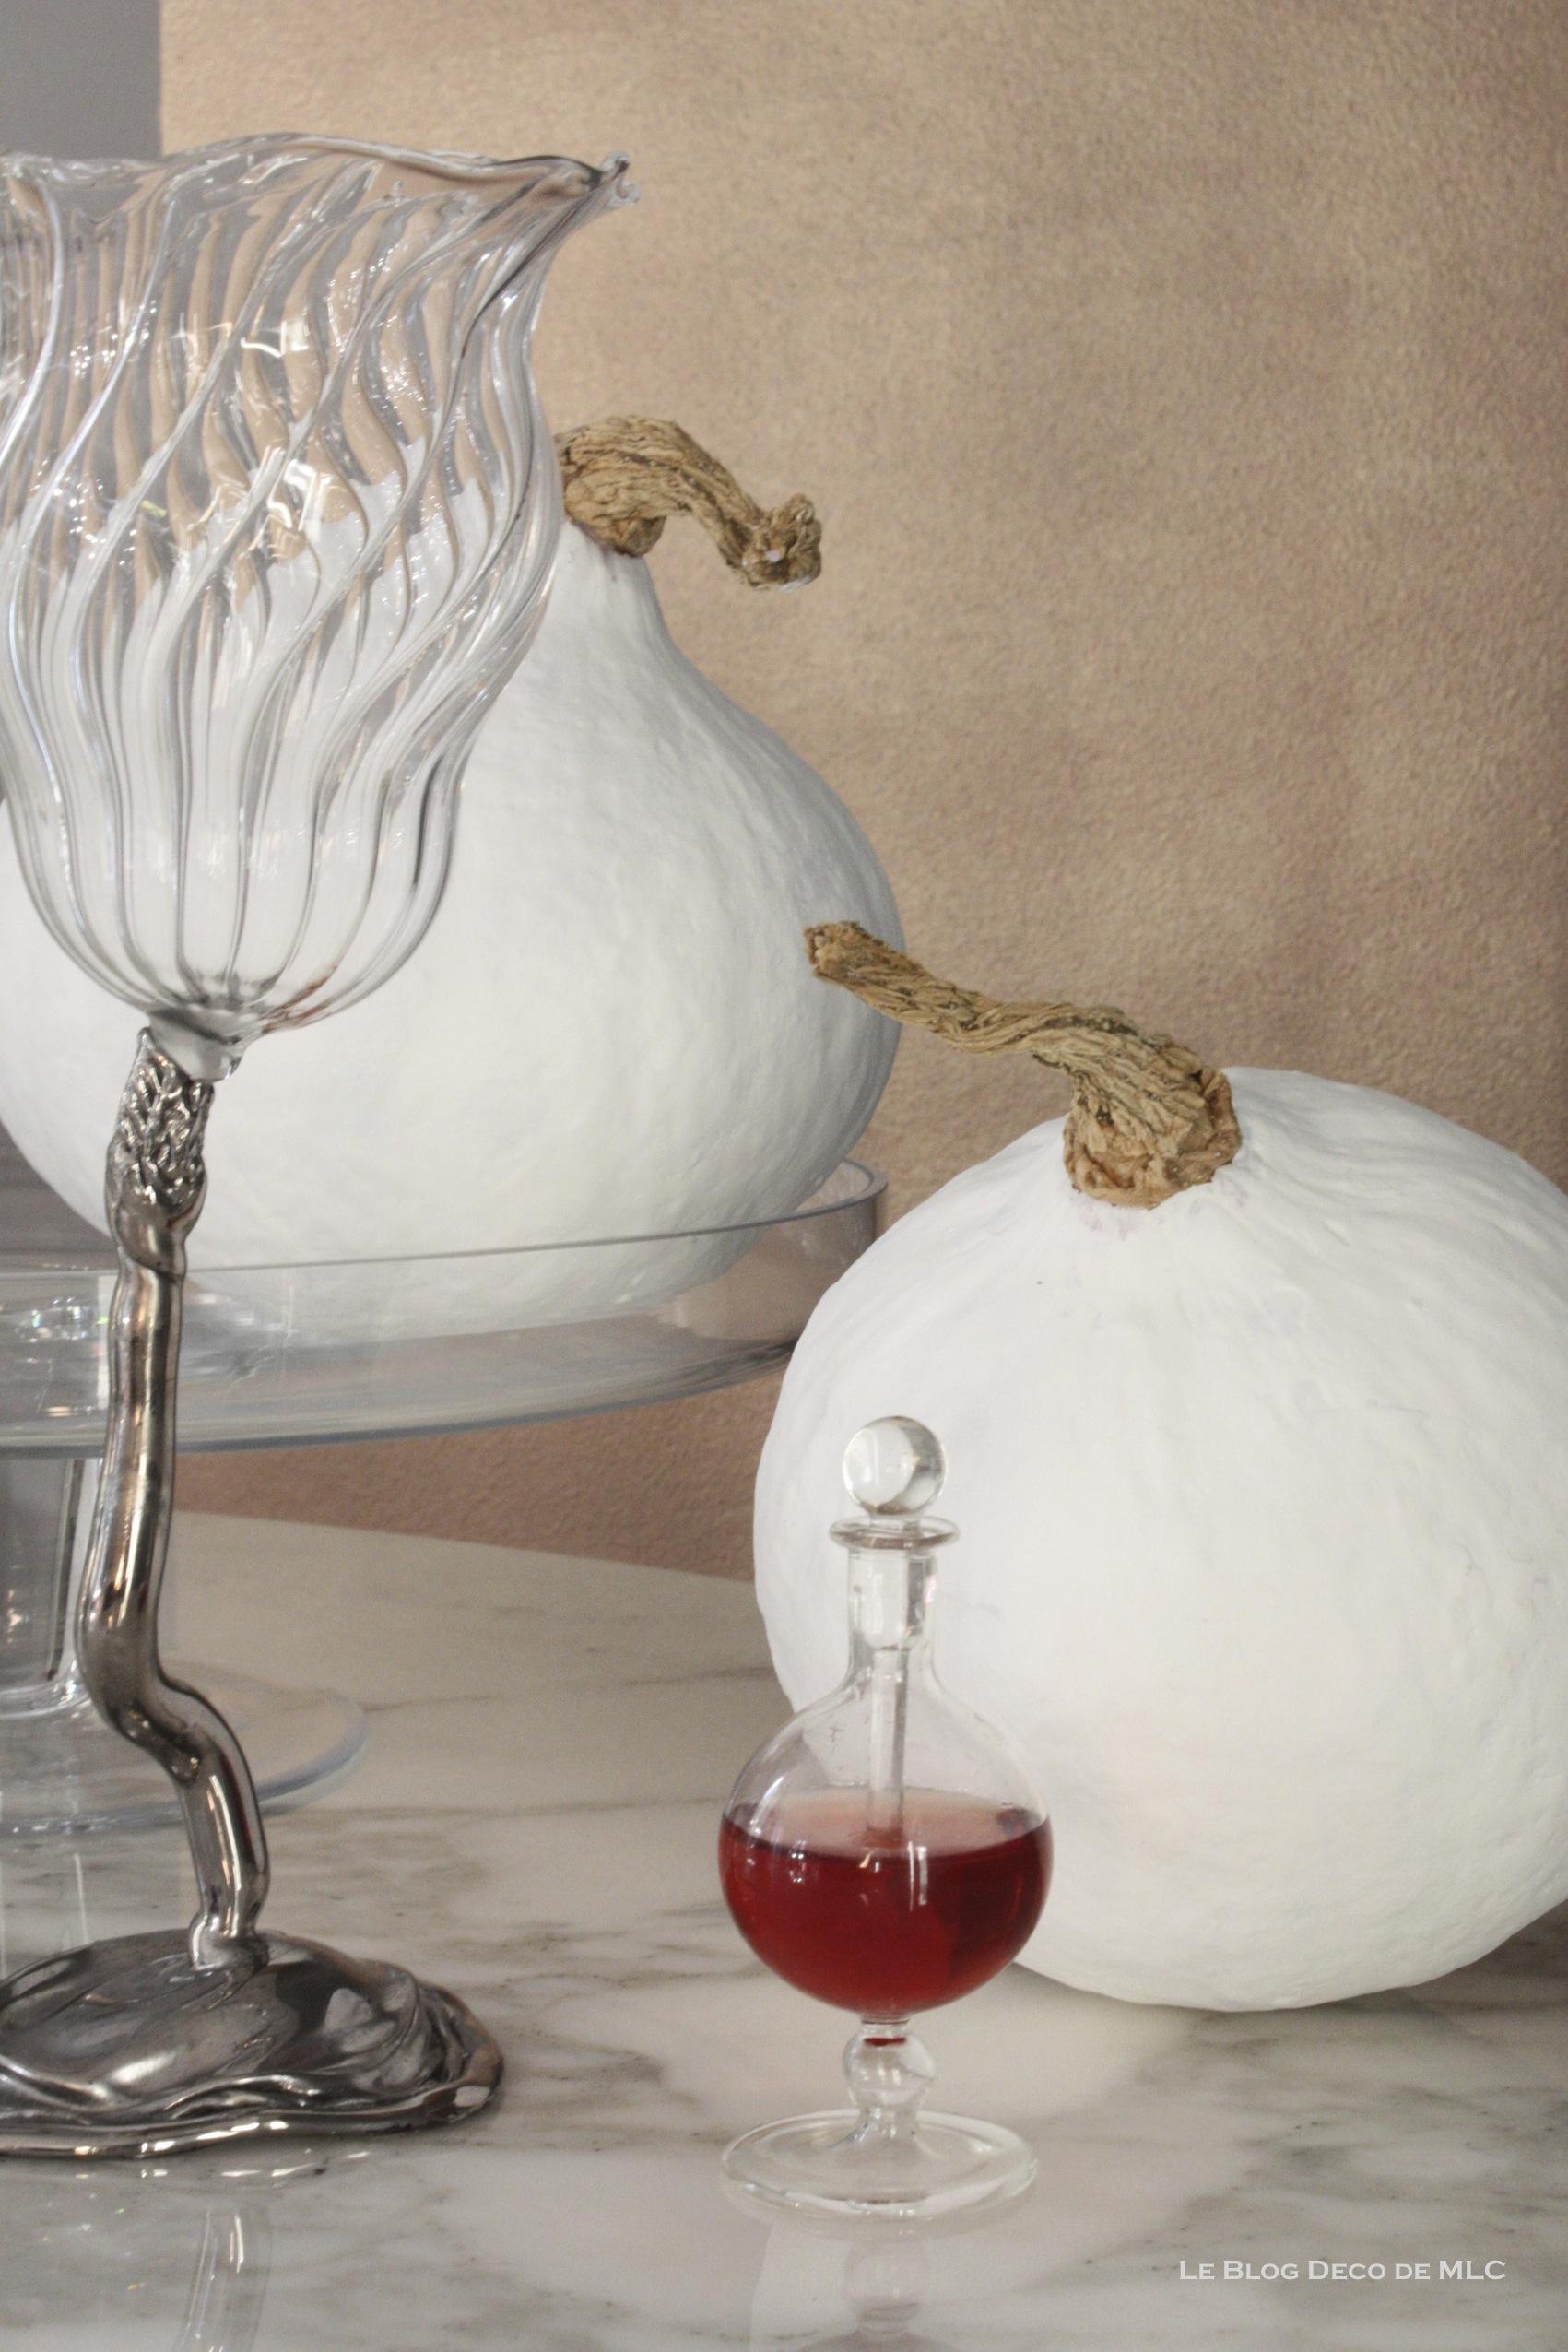 decoration citrouille blanche. Black Bedroom Furniture Sets. Home Design Ideas